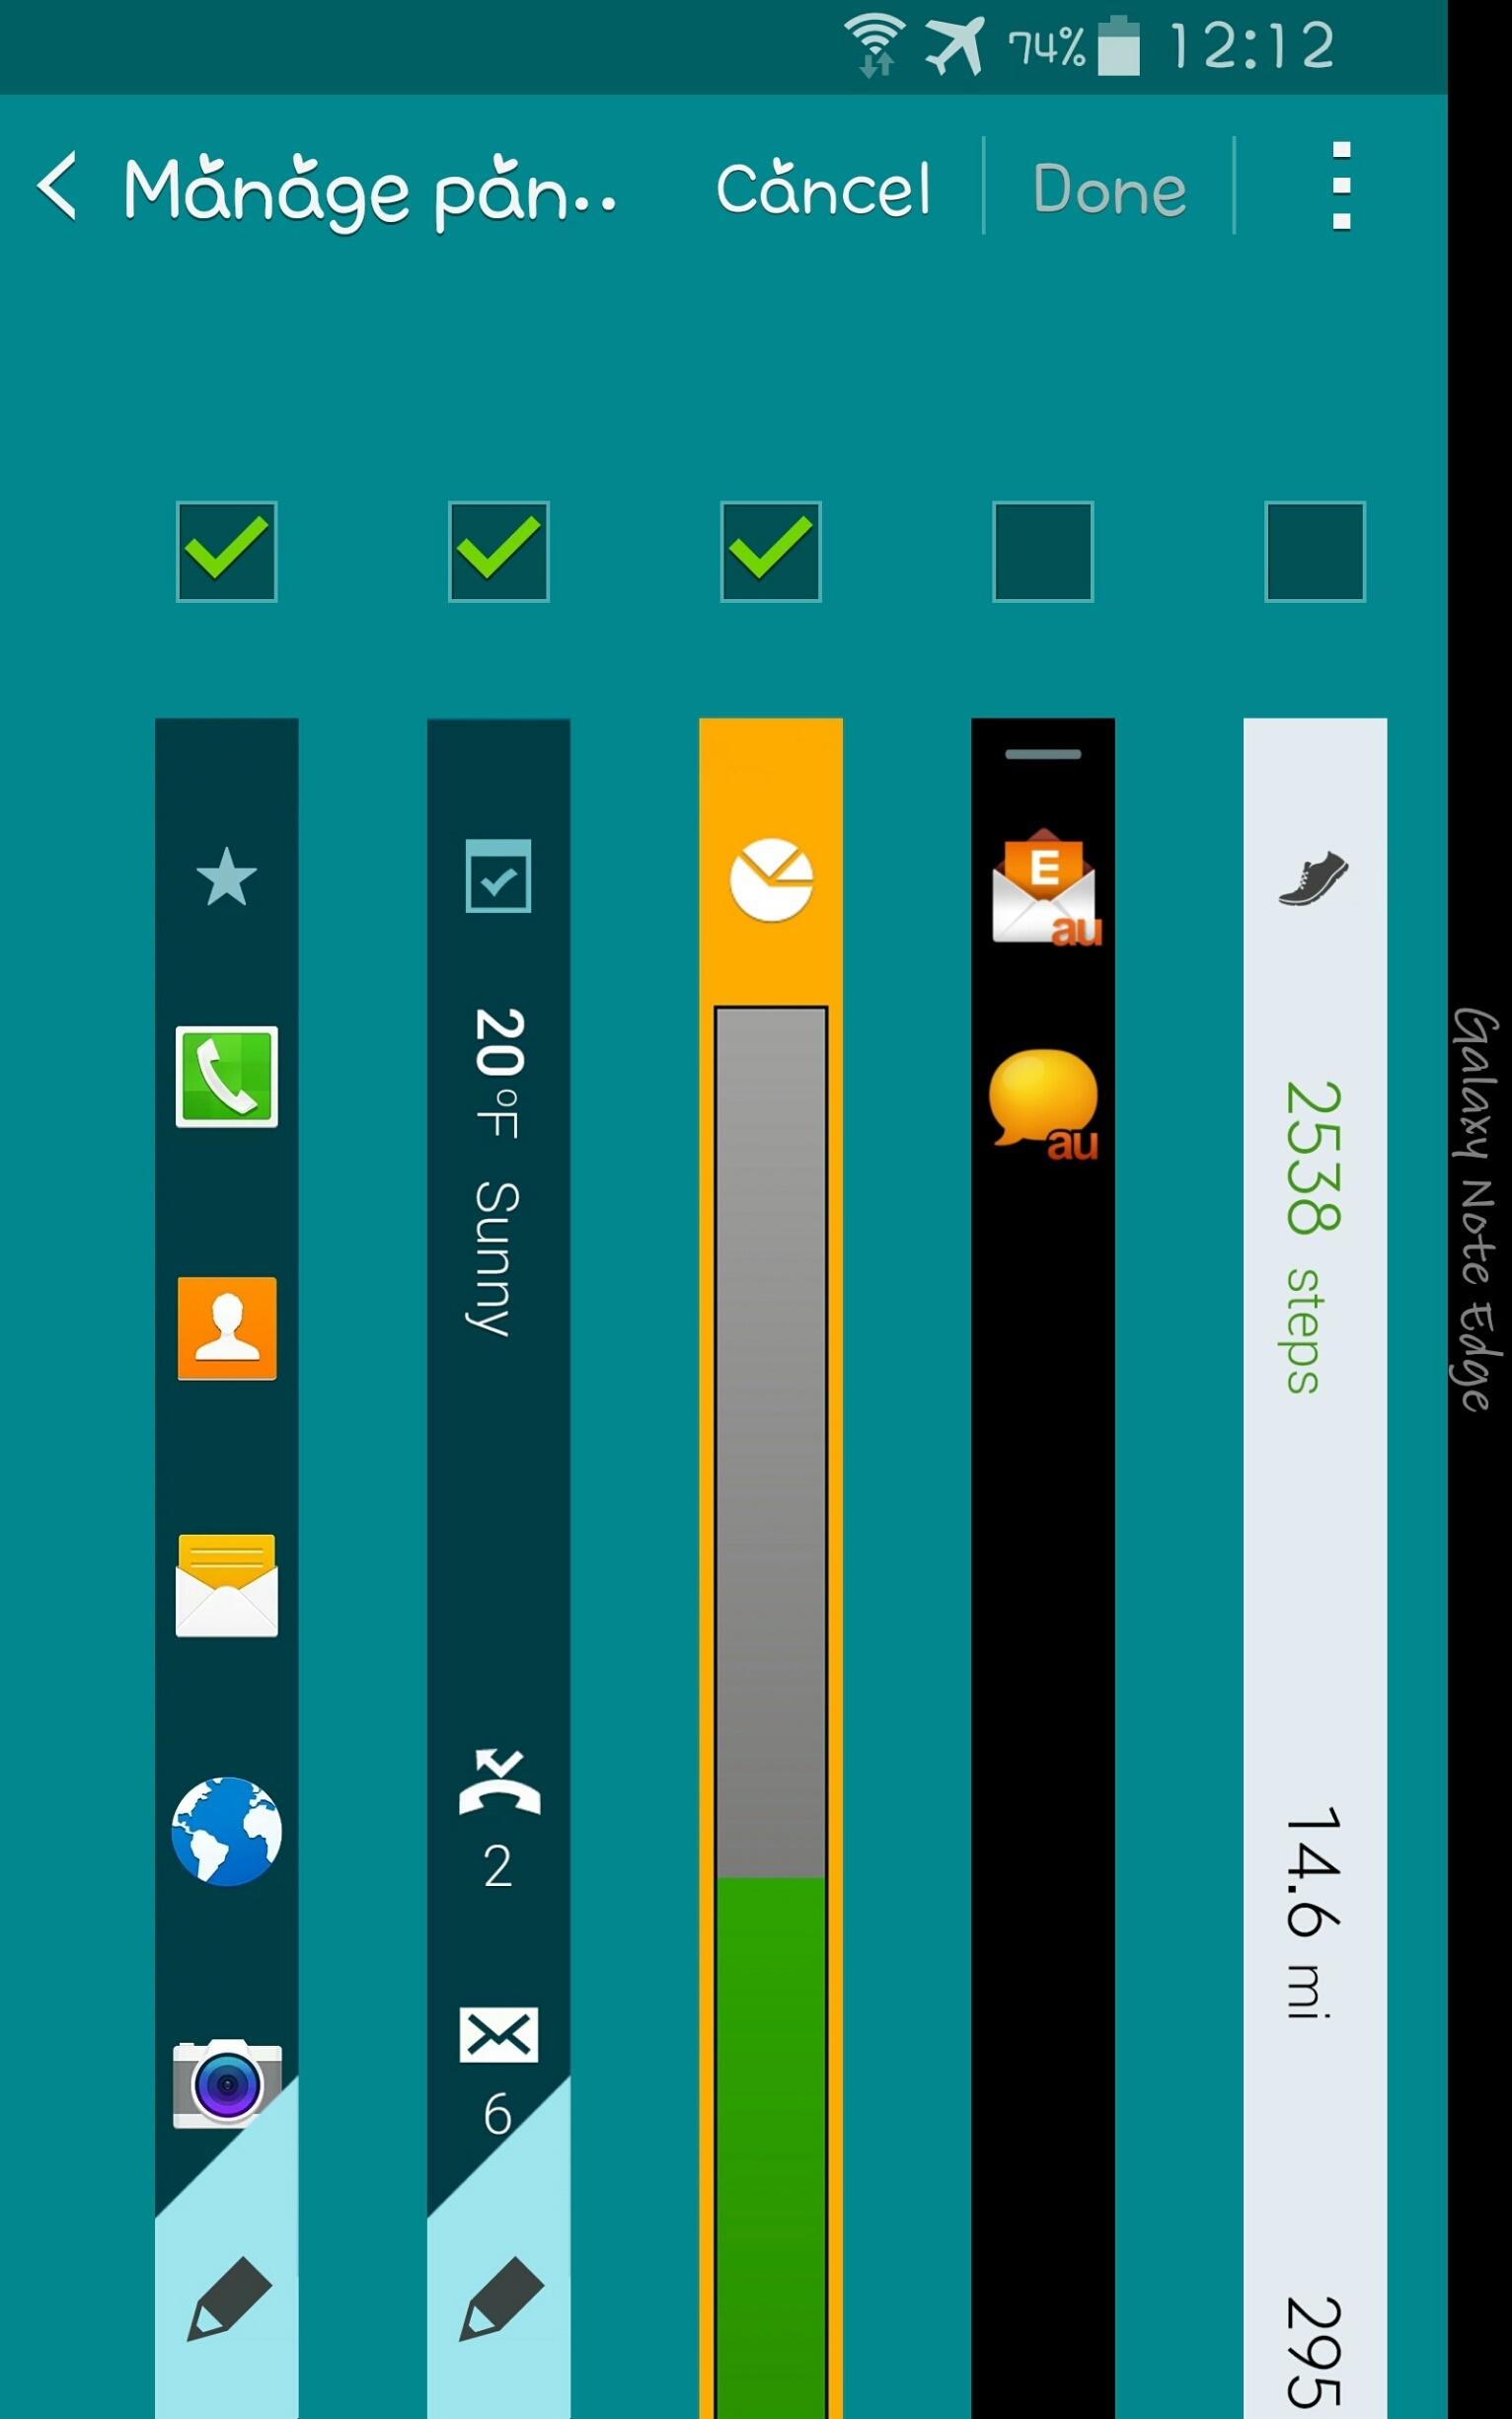 Samsung Galaxy Note Edge Software 11